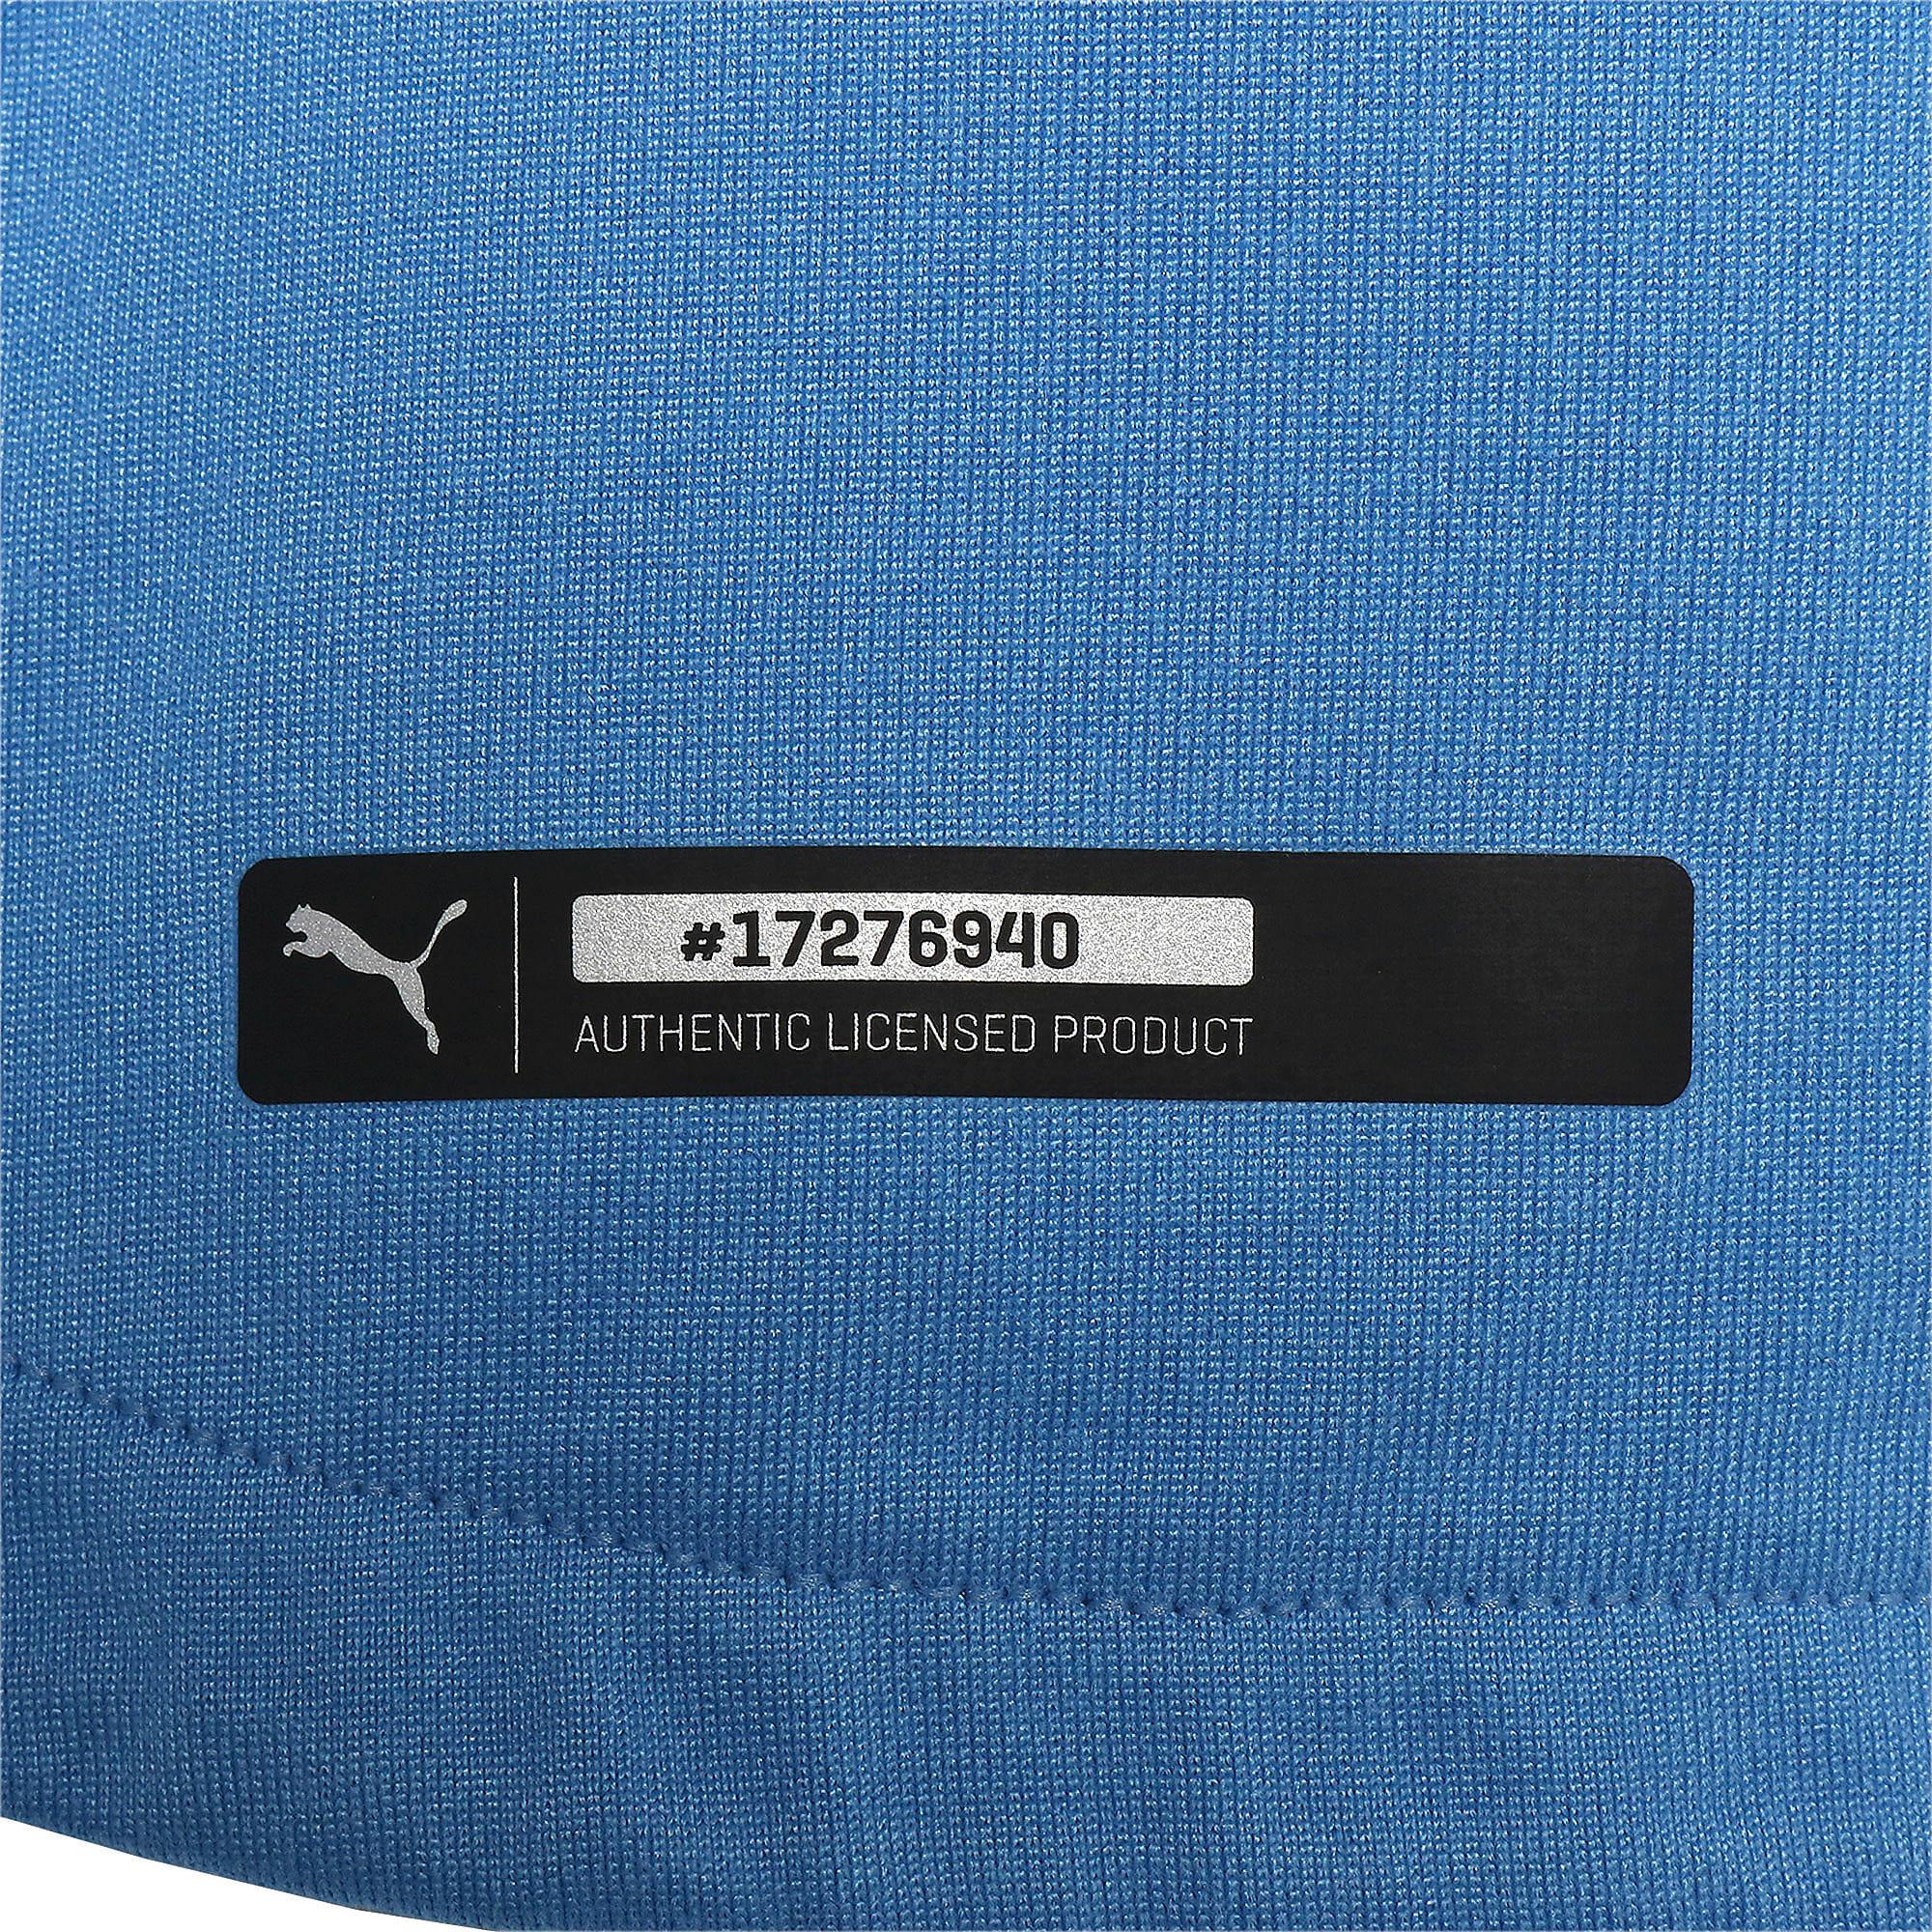 Thumbnail 10 of マンチェスター・シティ MCFC 125th アニバーサリー オーセンティックシャツ ユニフォーム, Marina-Puma White, medium-JPN